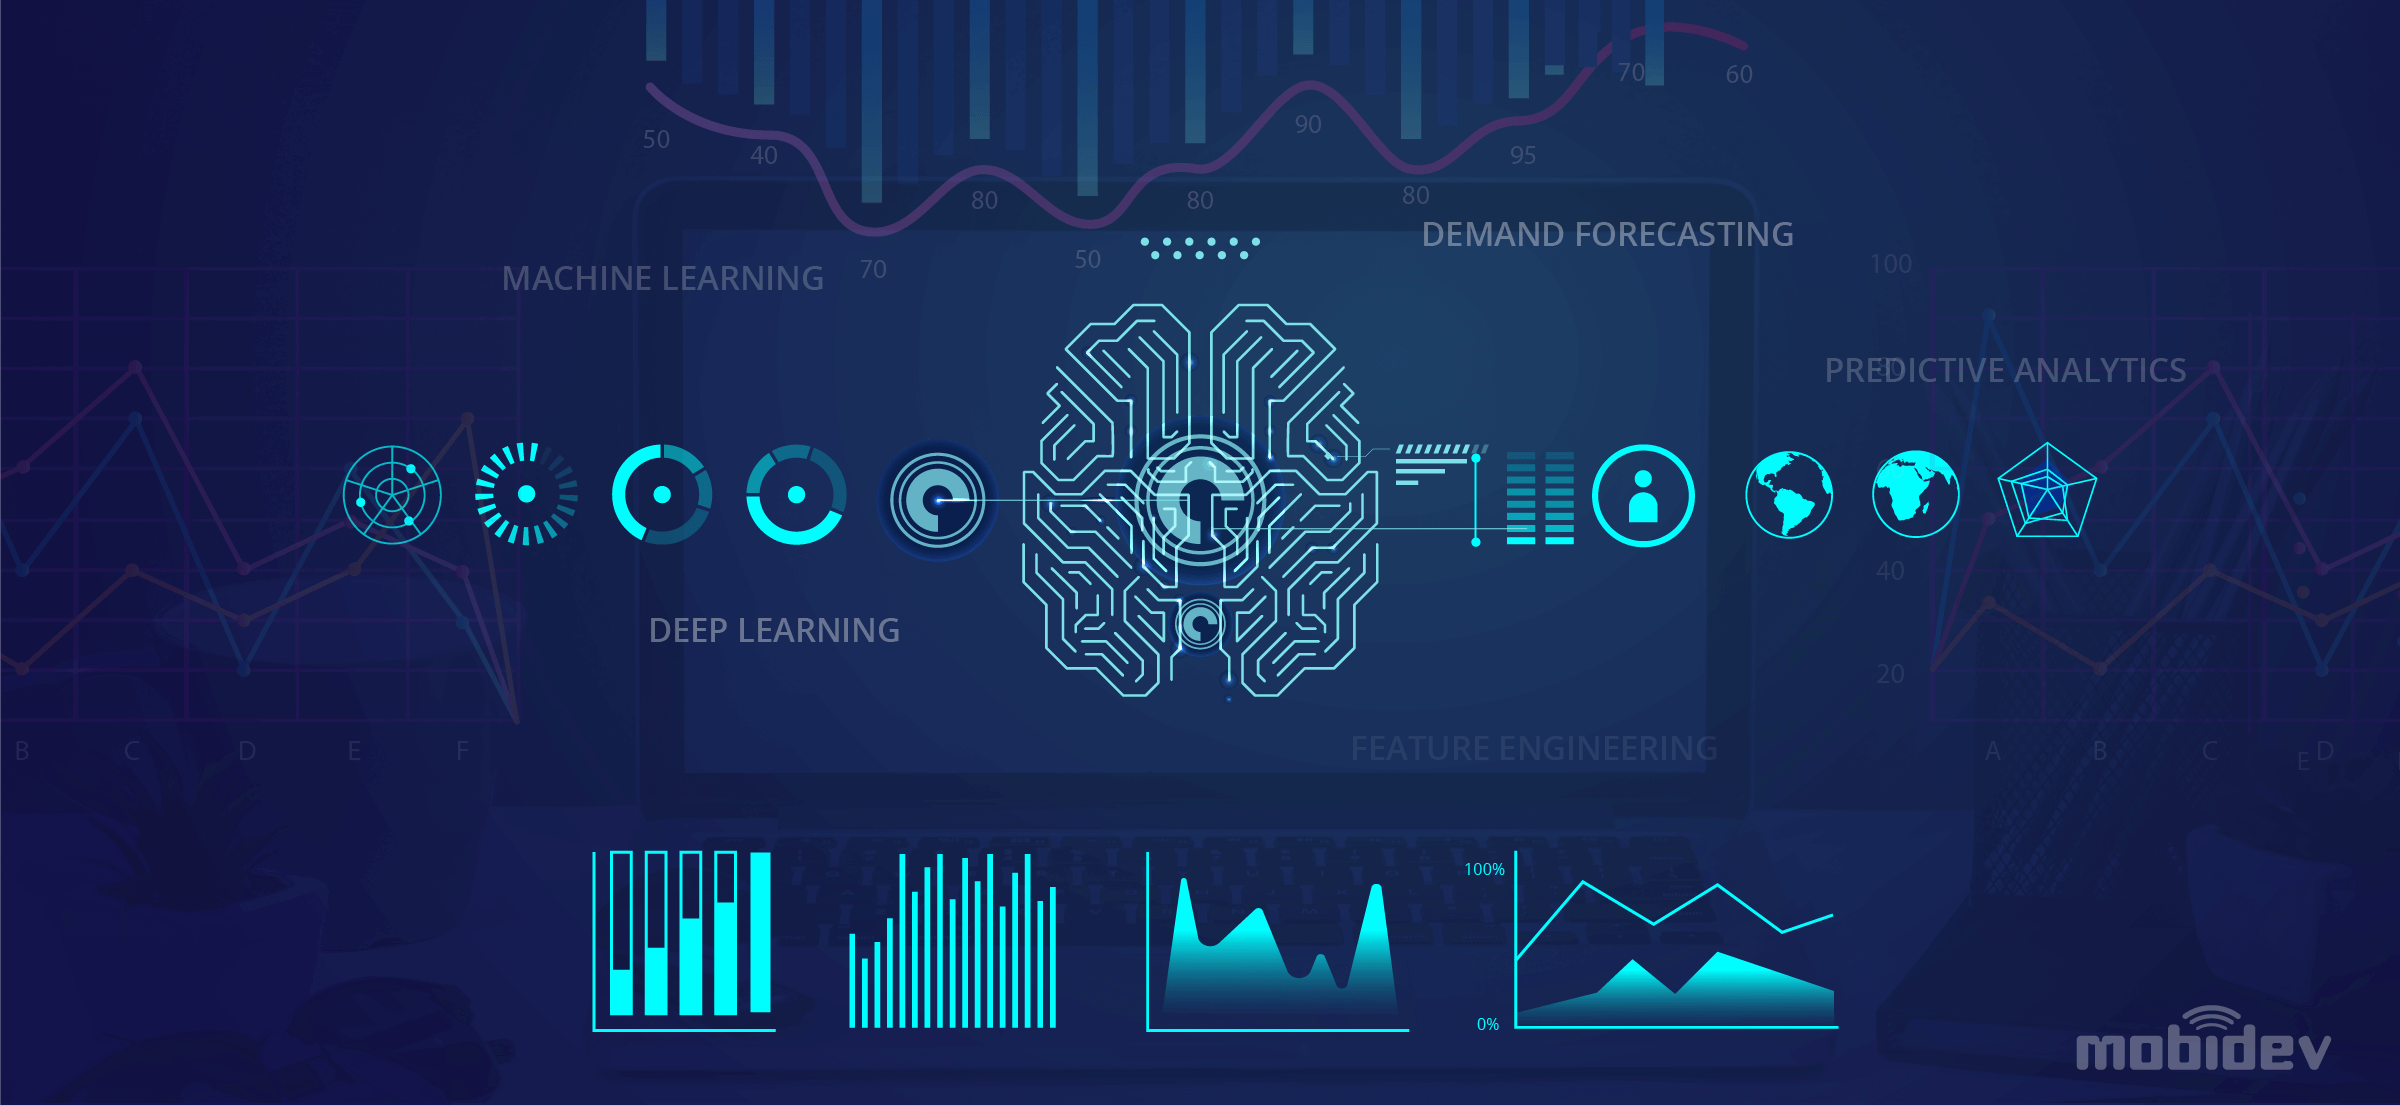 /demand-forecasting-for-retail-a-deep-dive-i91o3z1b feature image